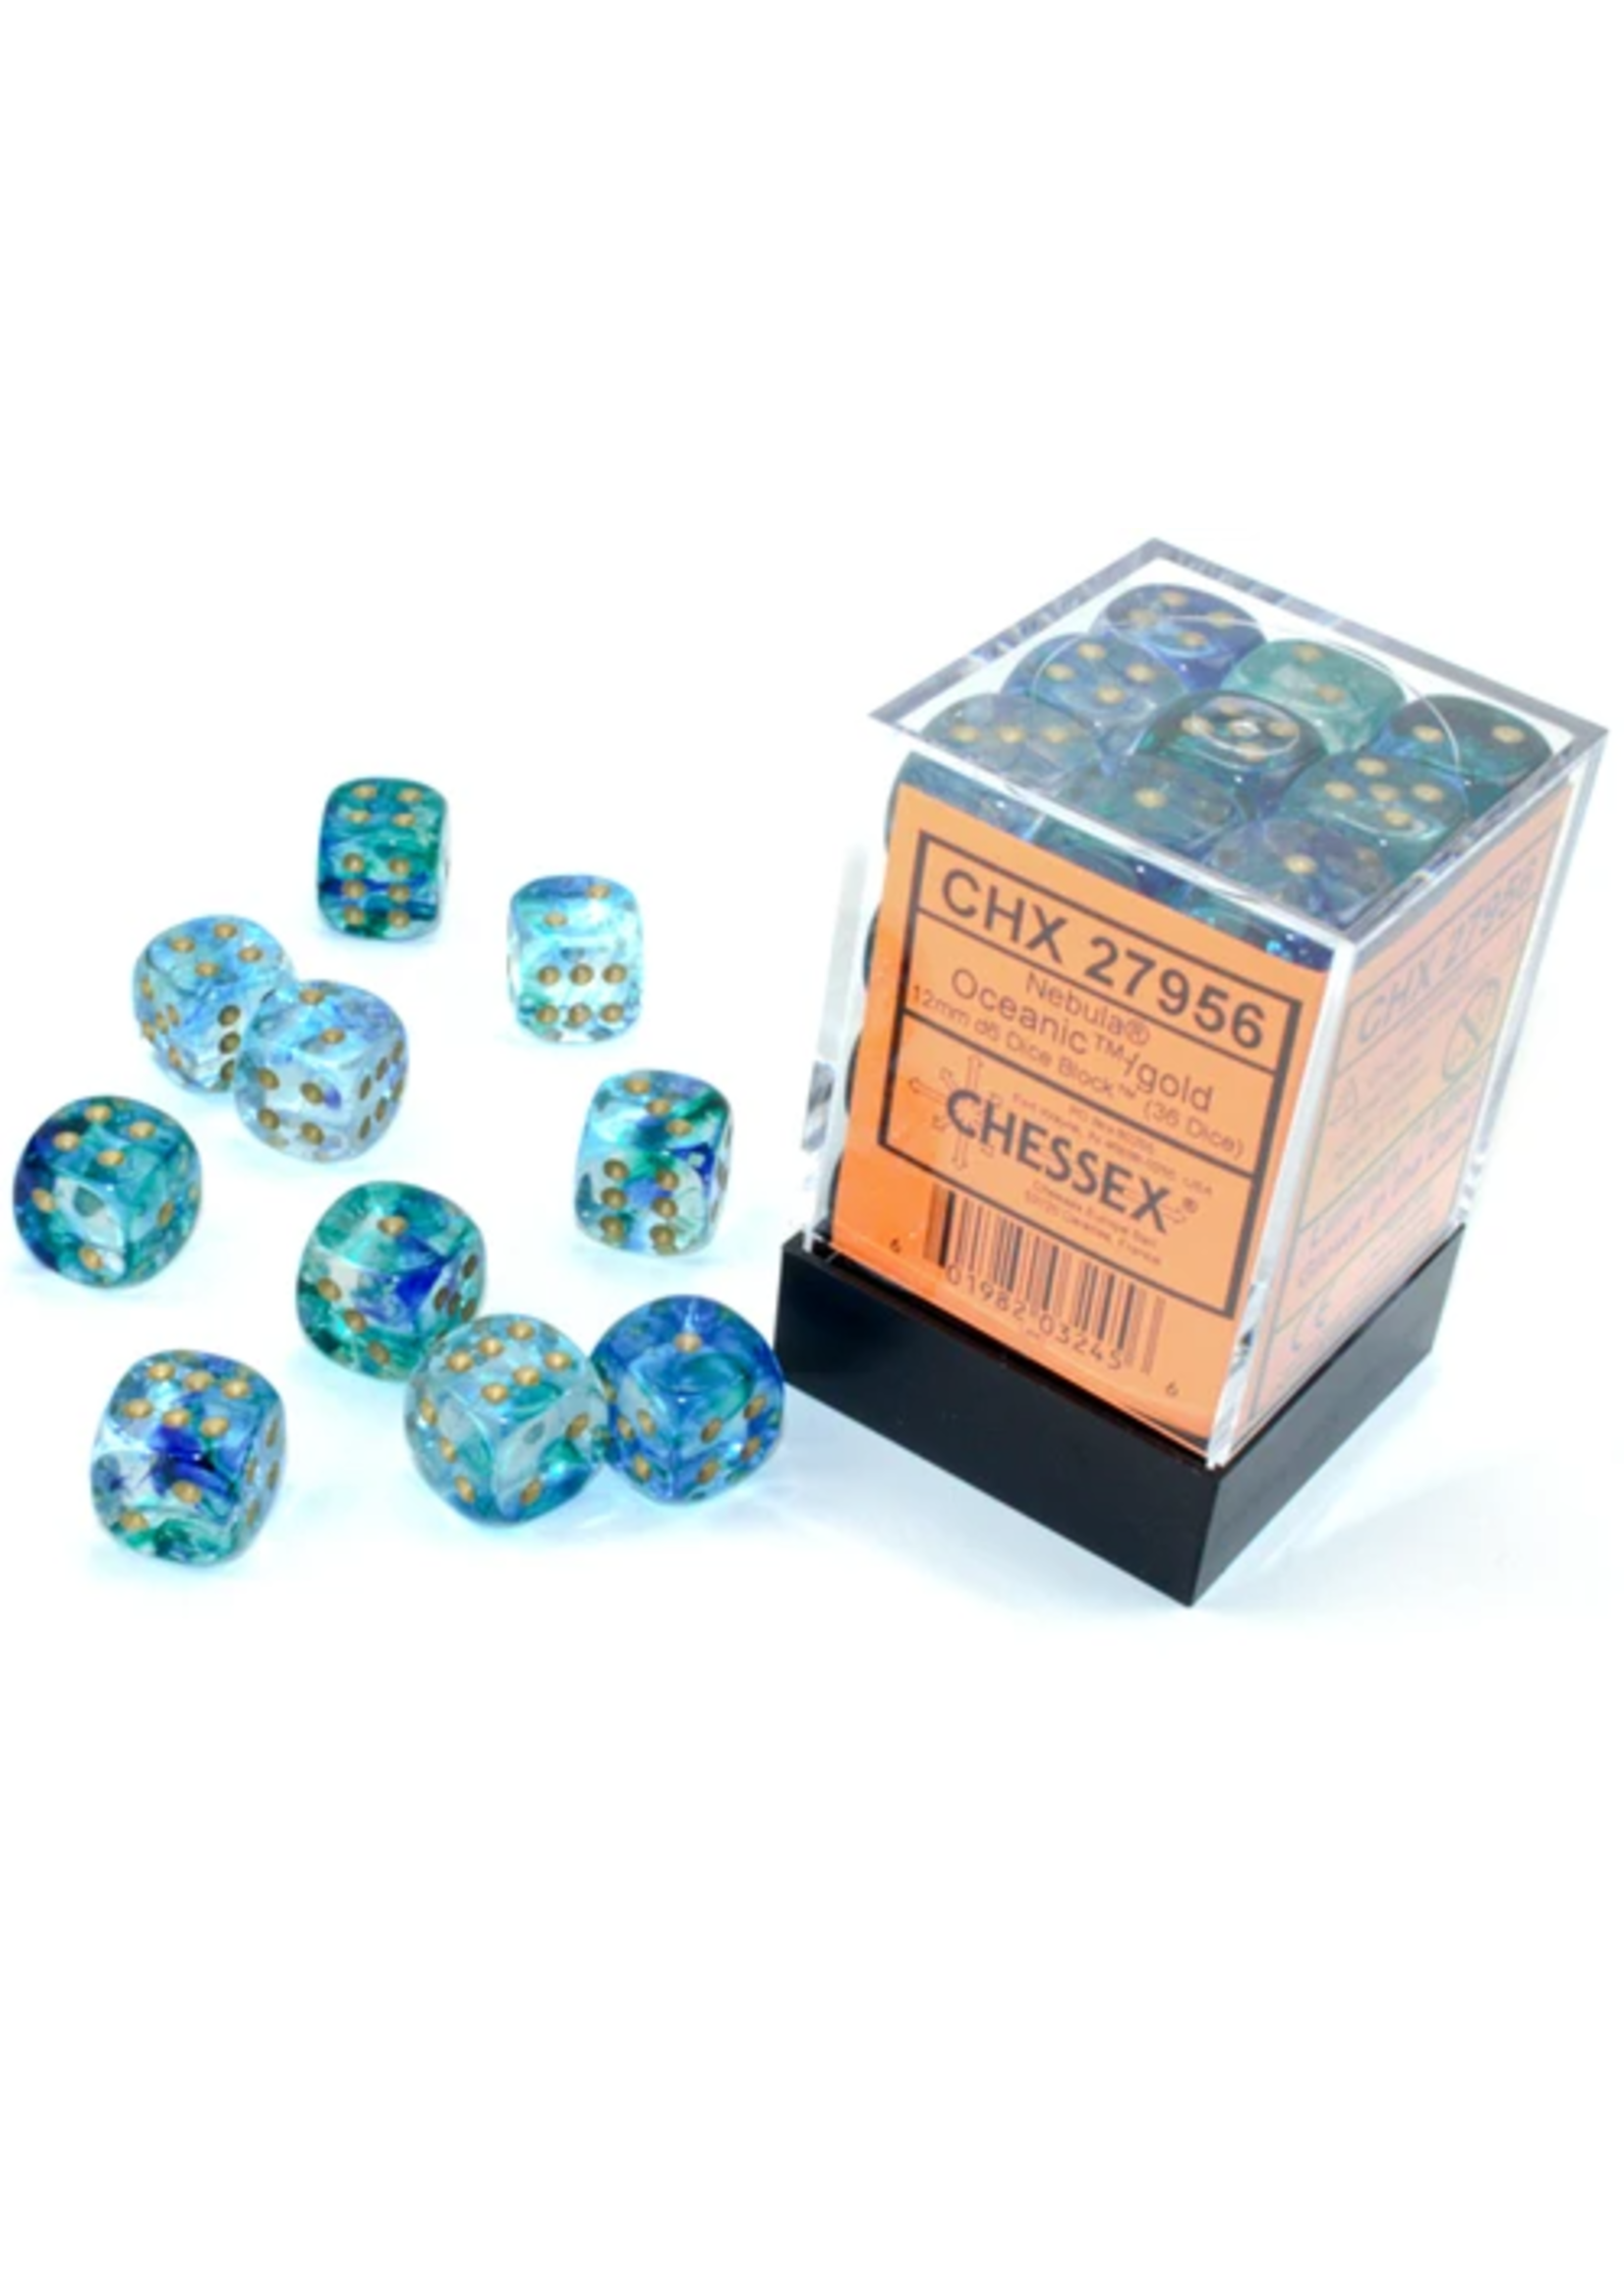 Chessex 12mm d6 Blocks - Nebula TM 12mm d6 Oceanic/gold Luminary Dice Block™ (36 dice)